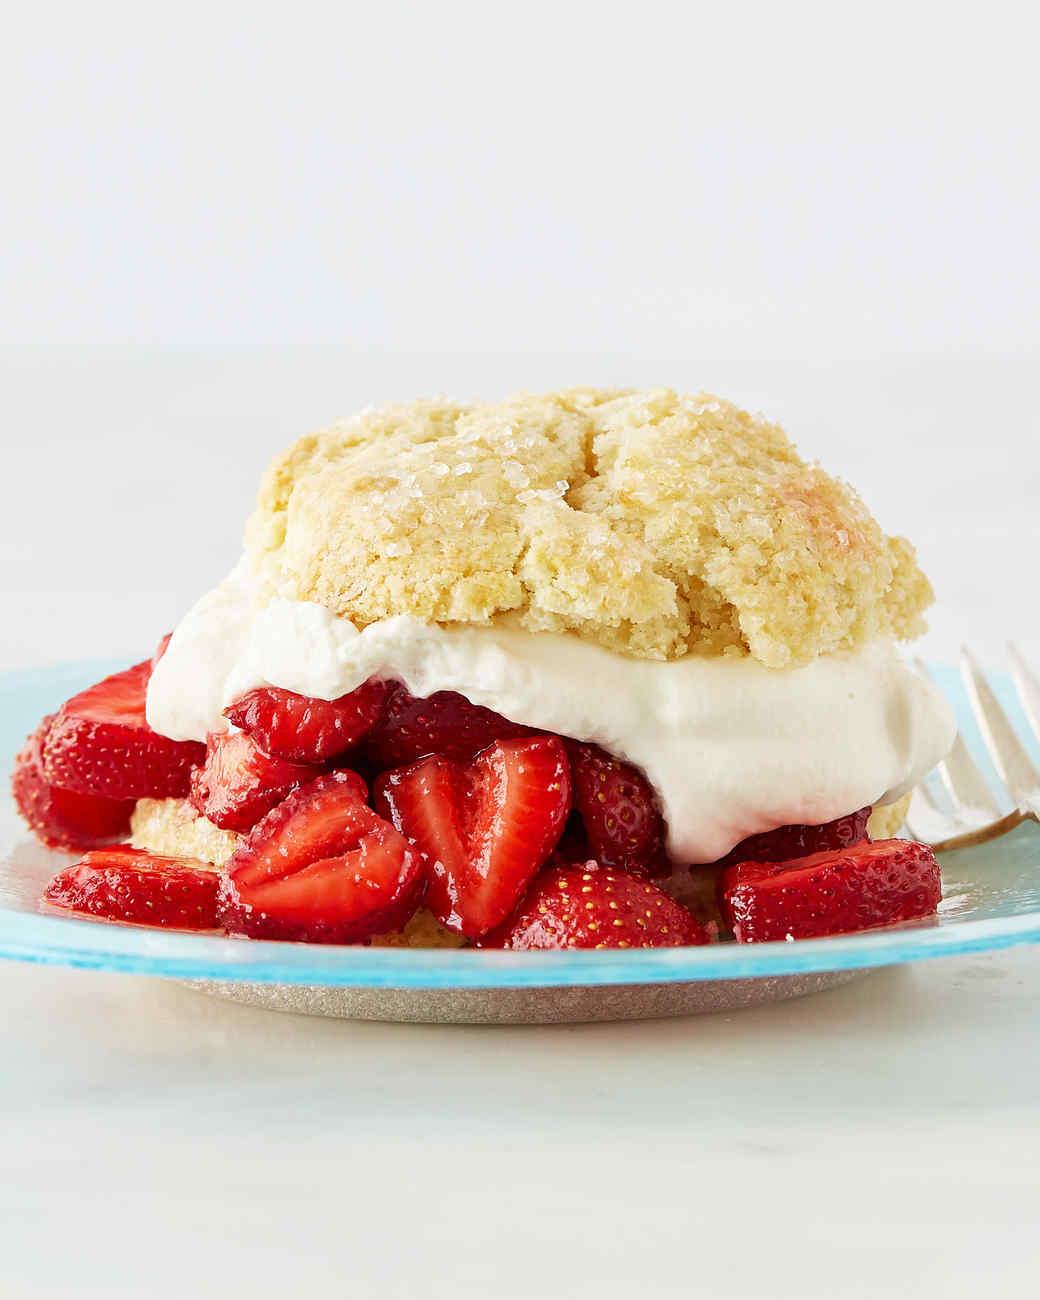 featured-recipe-strawberry-shortcake-100-vert-d113085.jpg